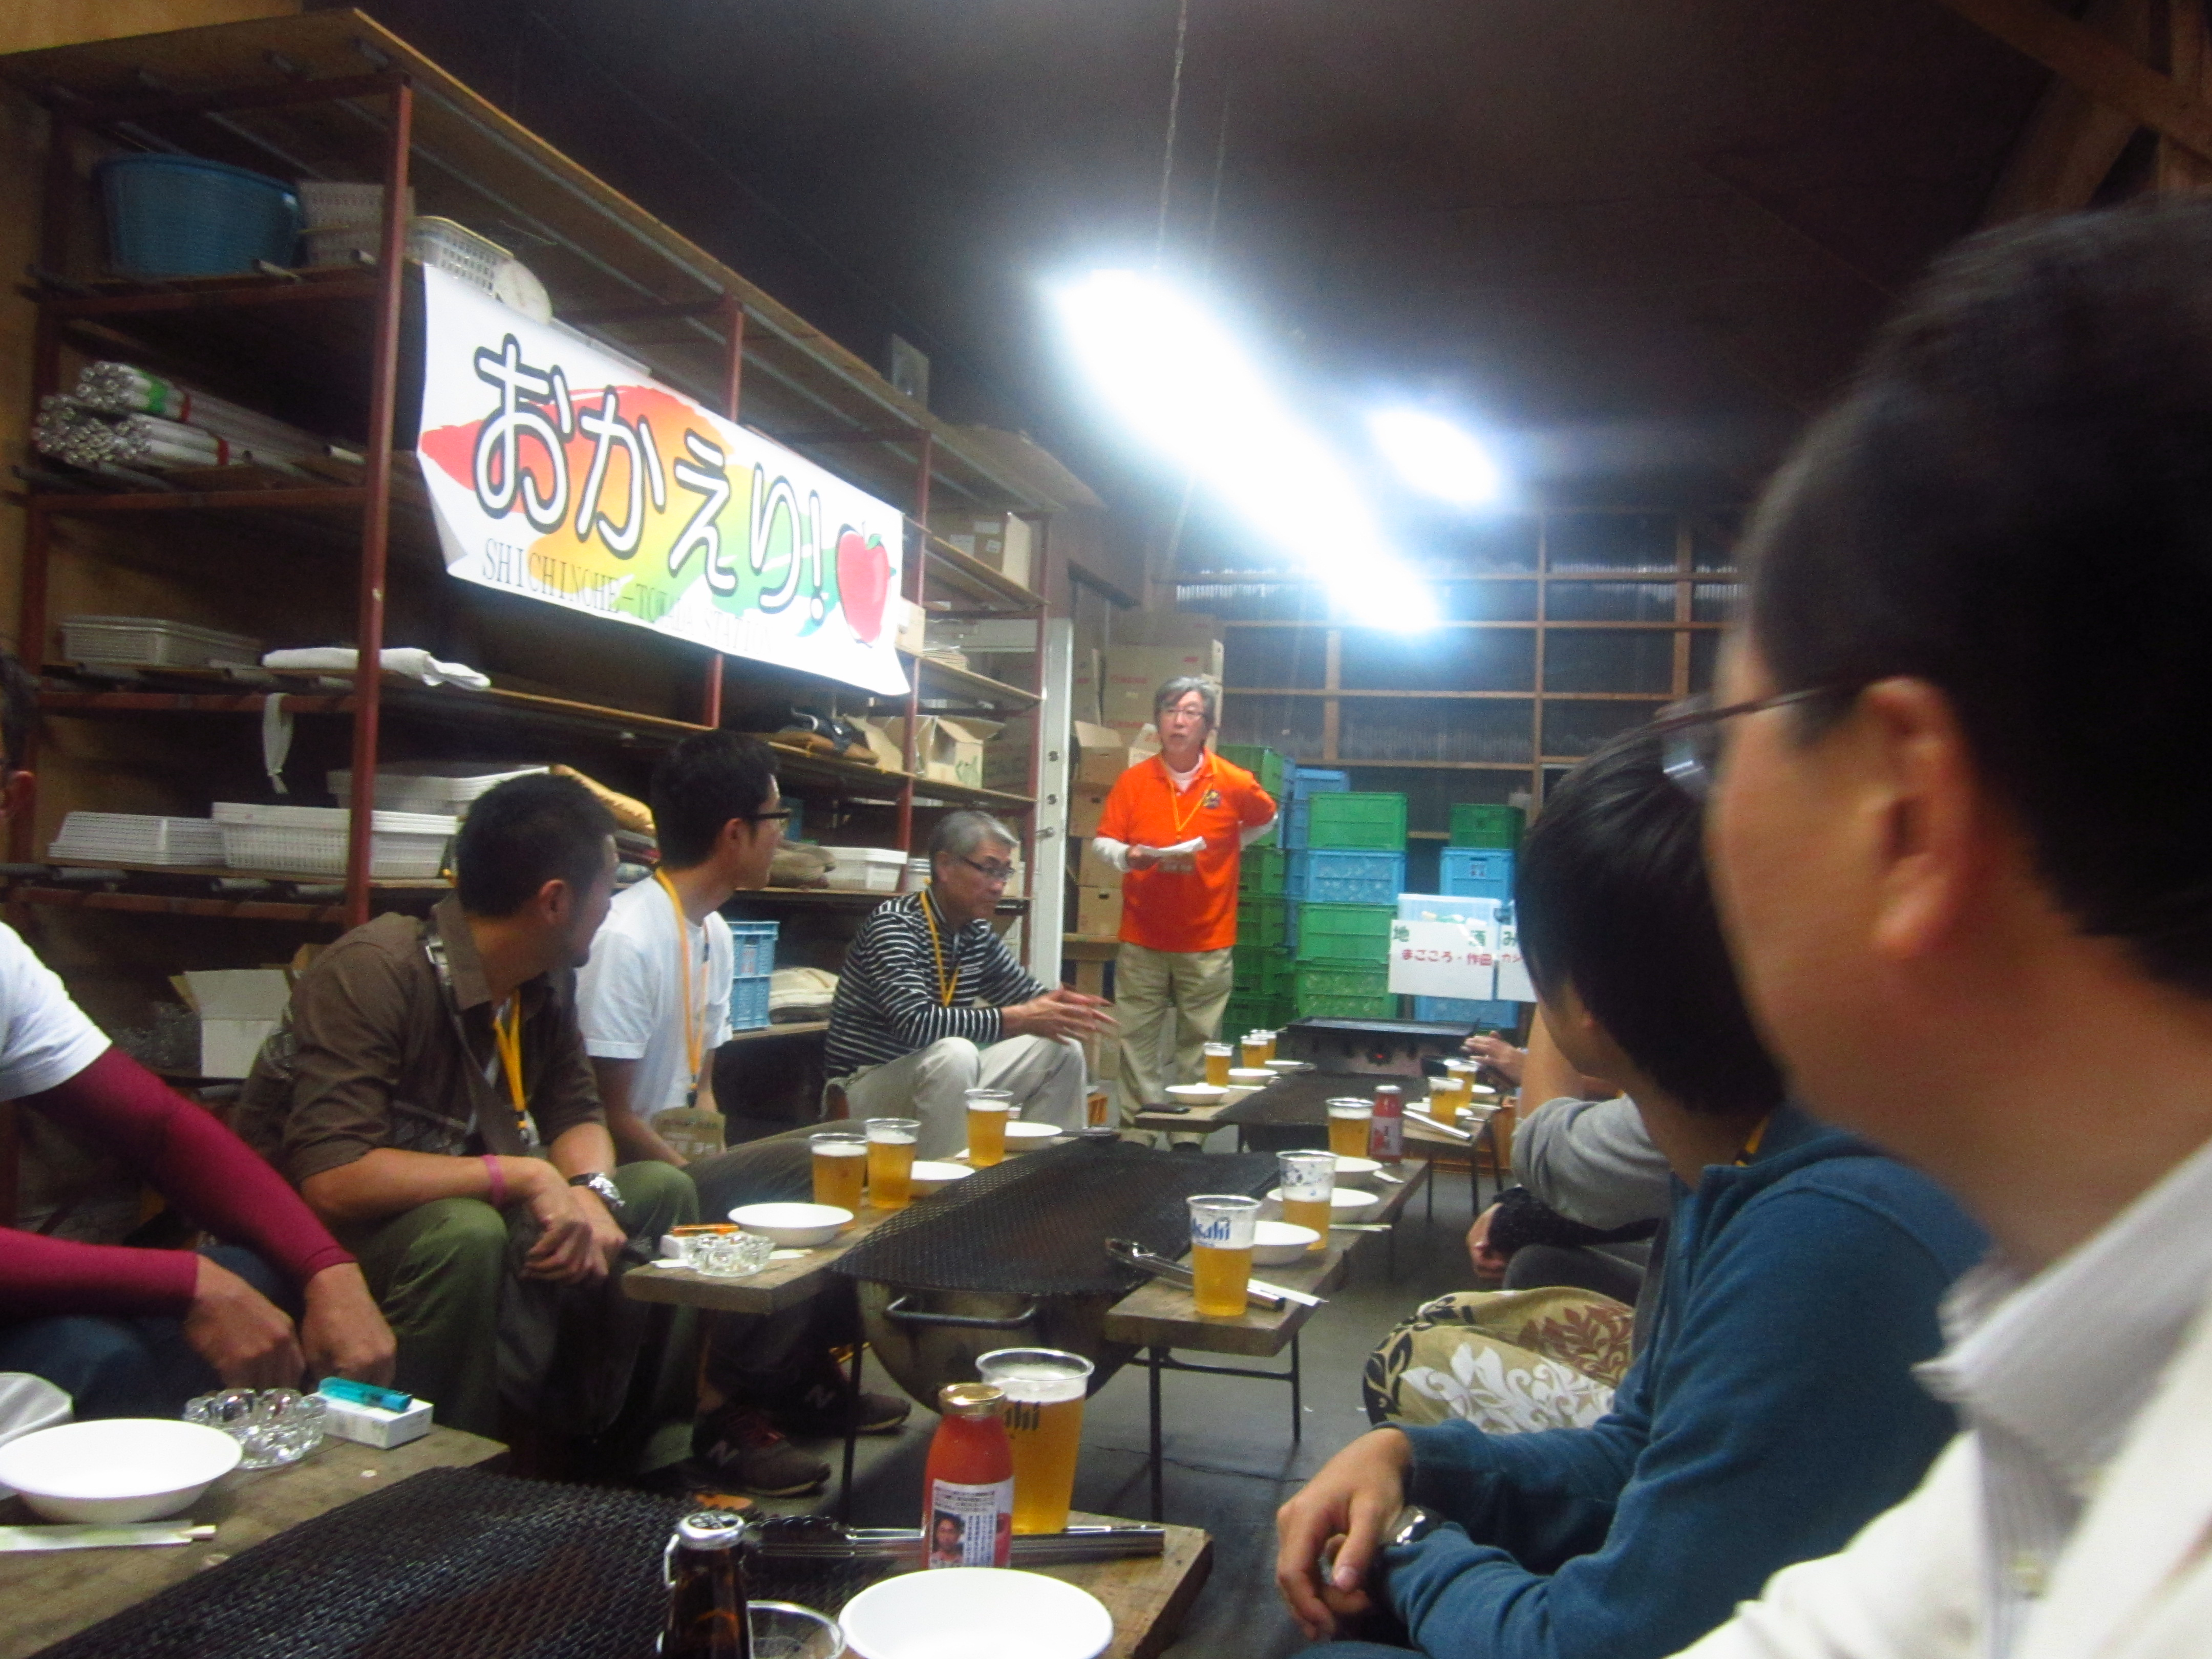 IMG 4292 - 麻布十番納涼祭り25,26日(七戸町出店)